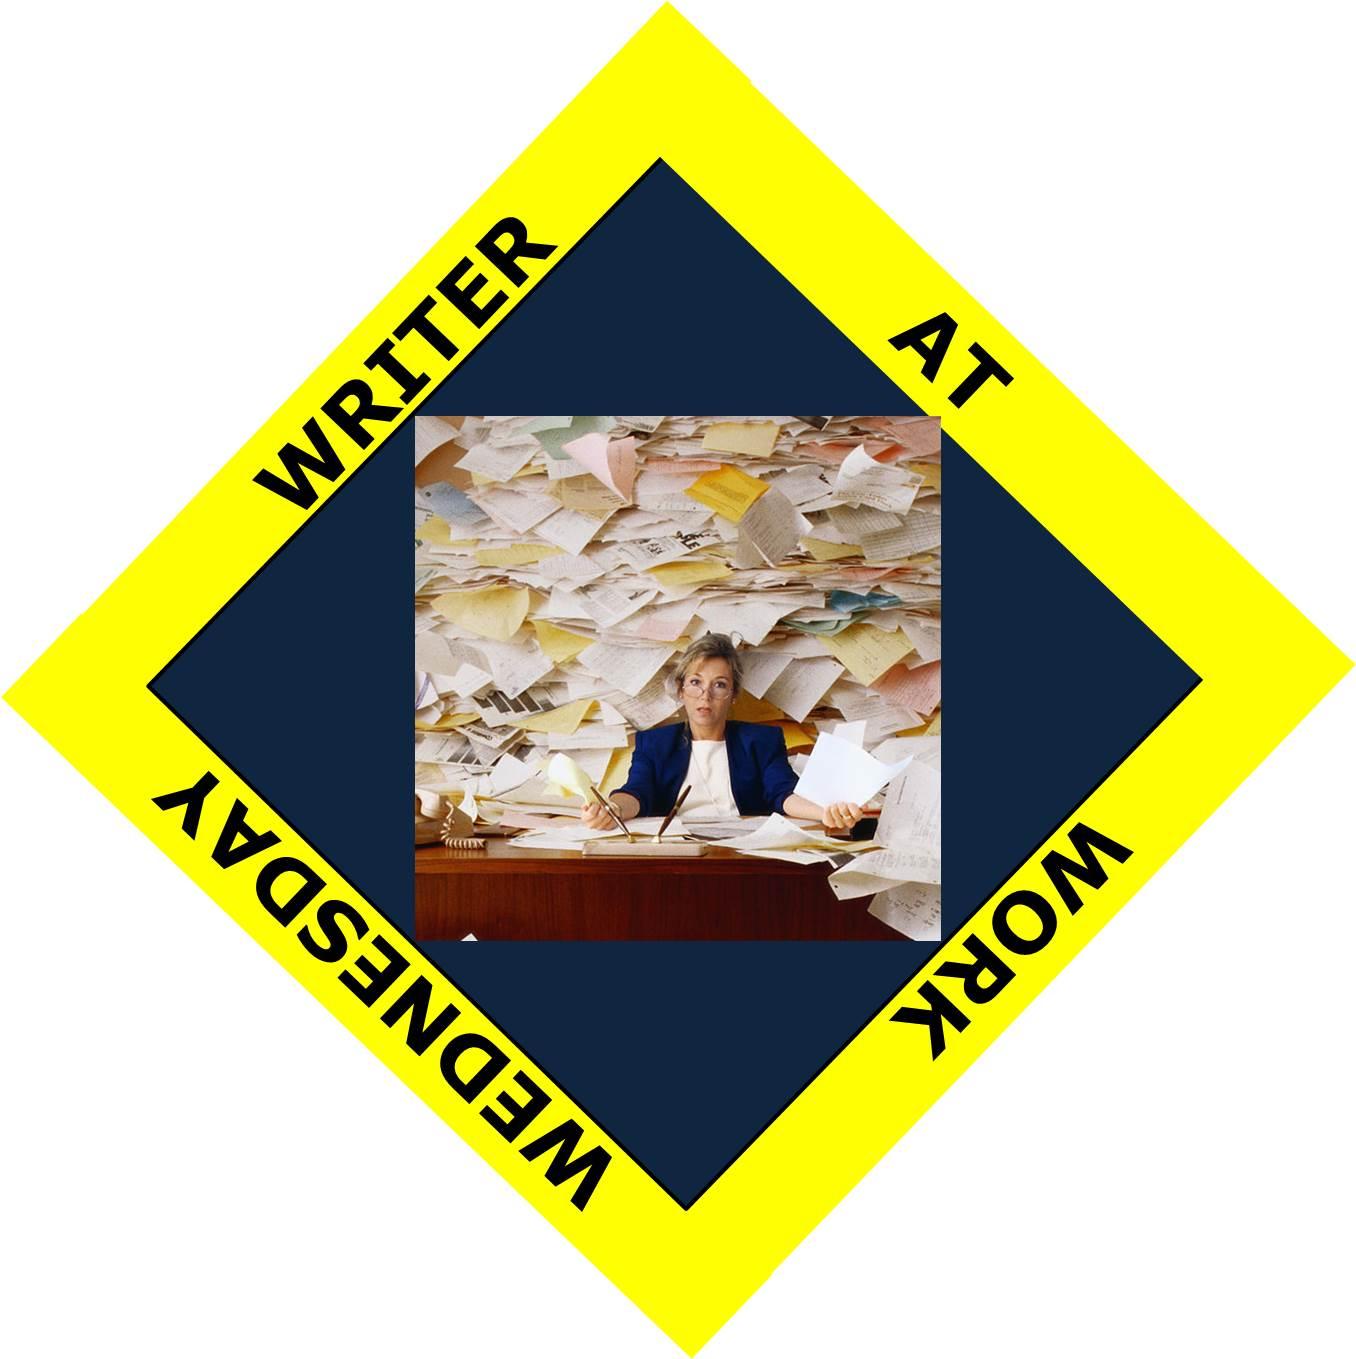 WriterAtWork5